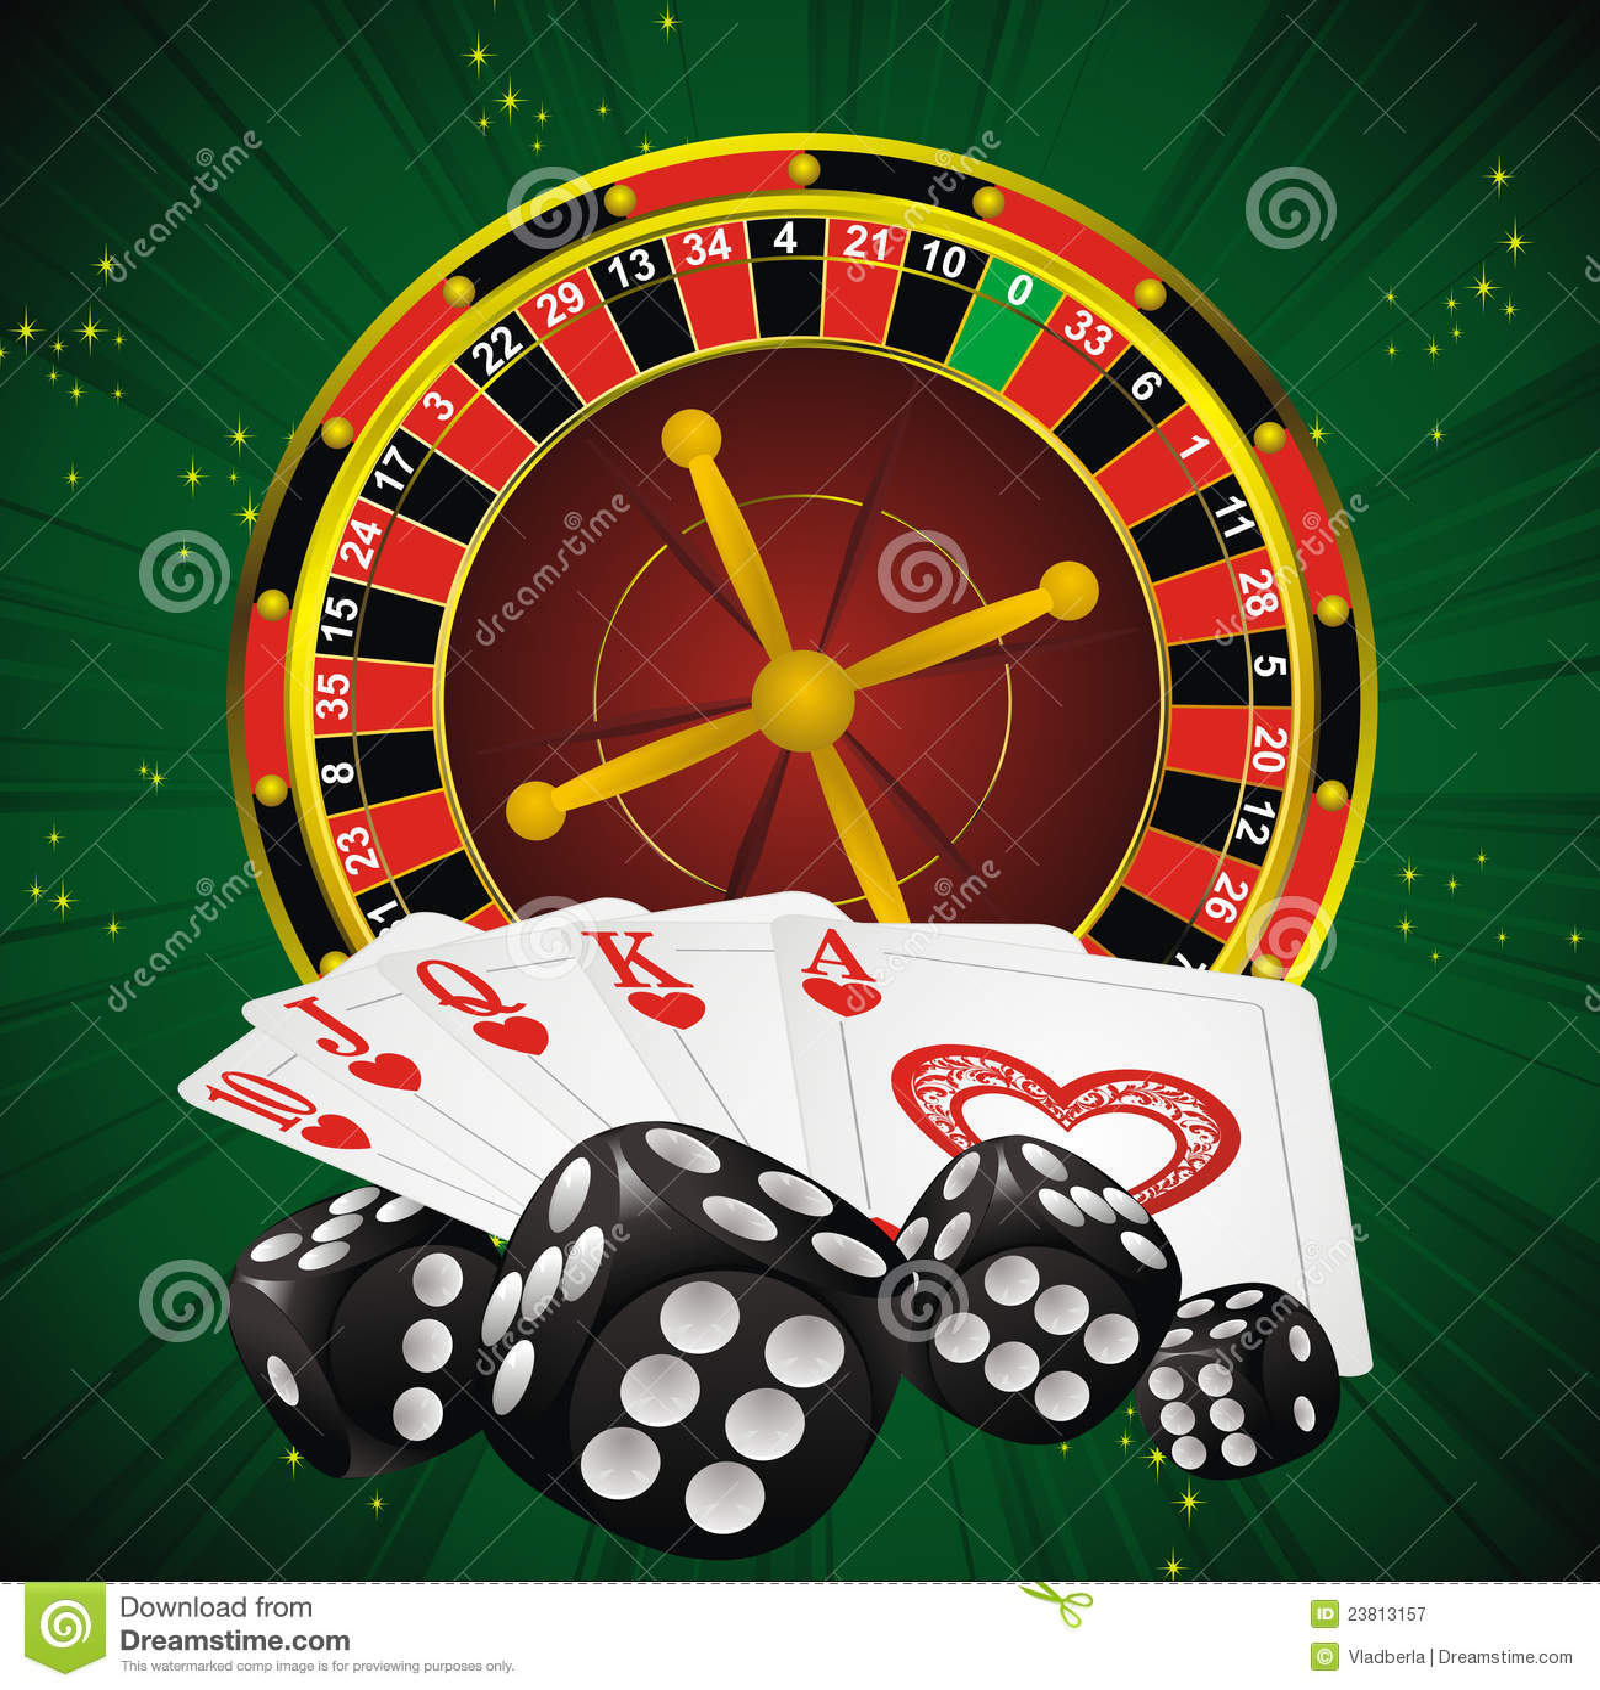 online casino gambling maya symbole